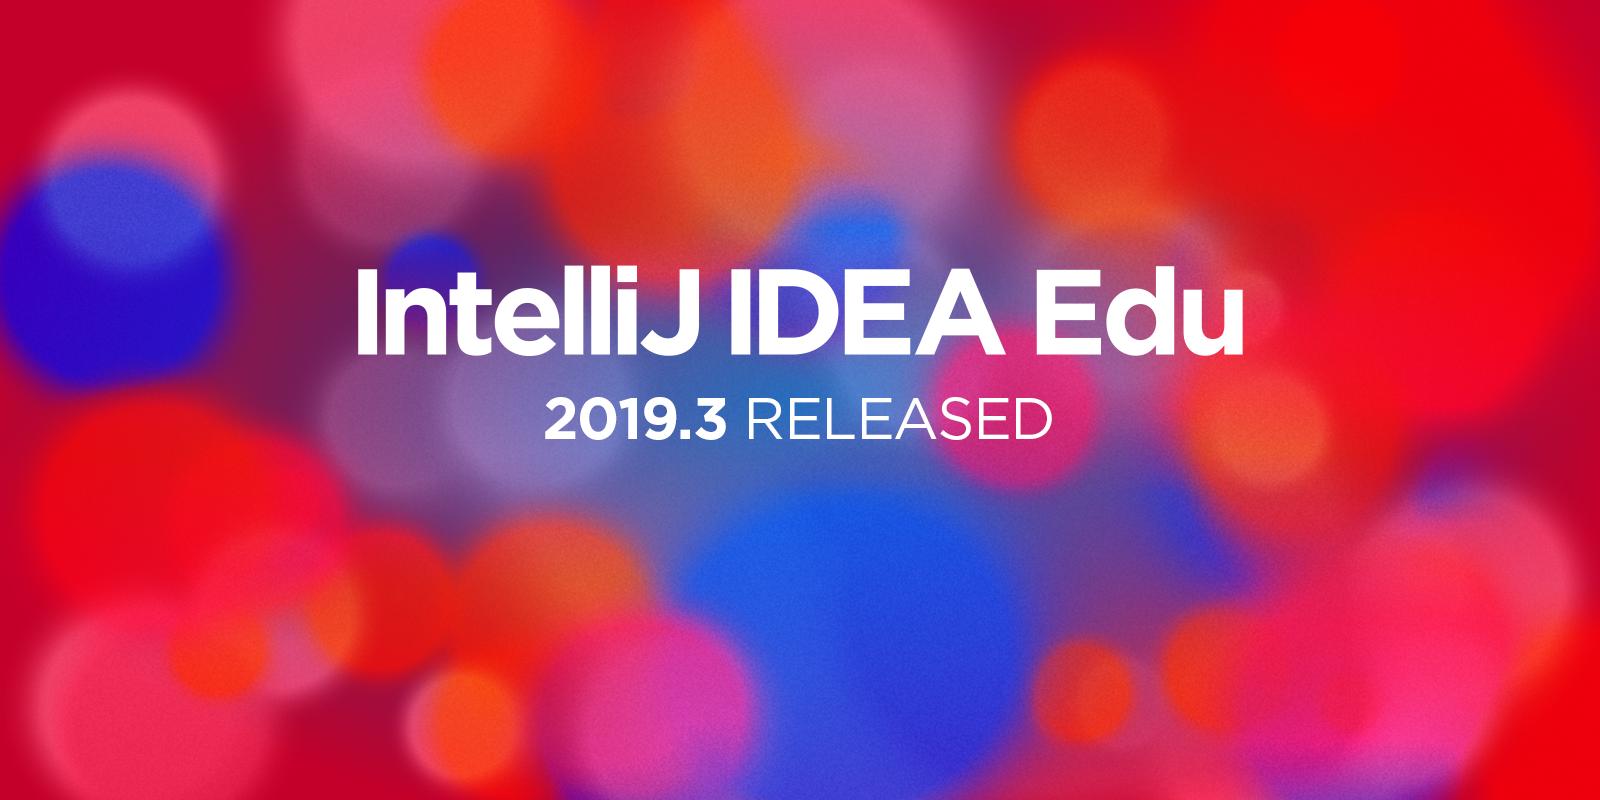 IntelliJ_IDEA_Edu_2019.3